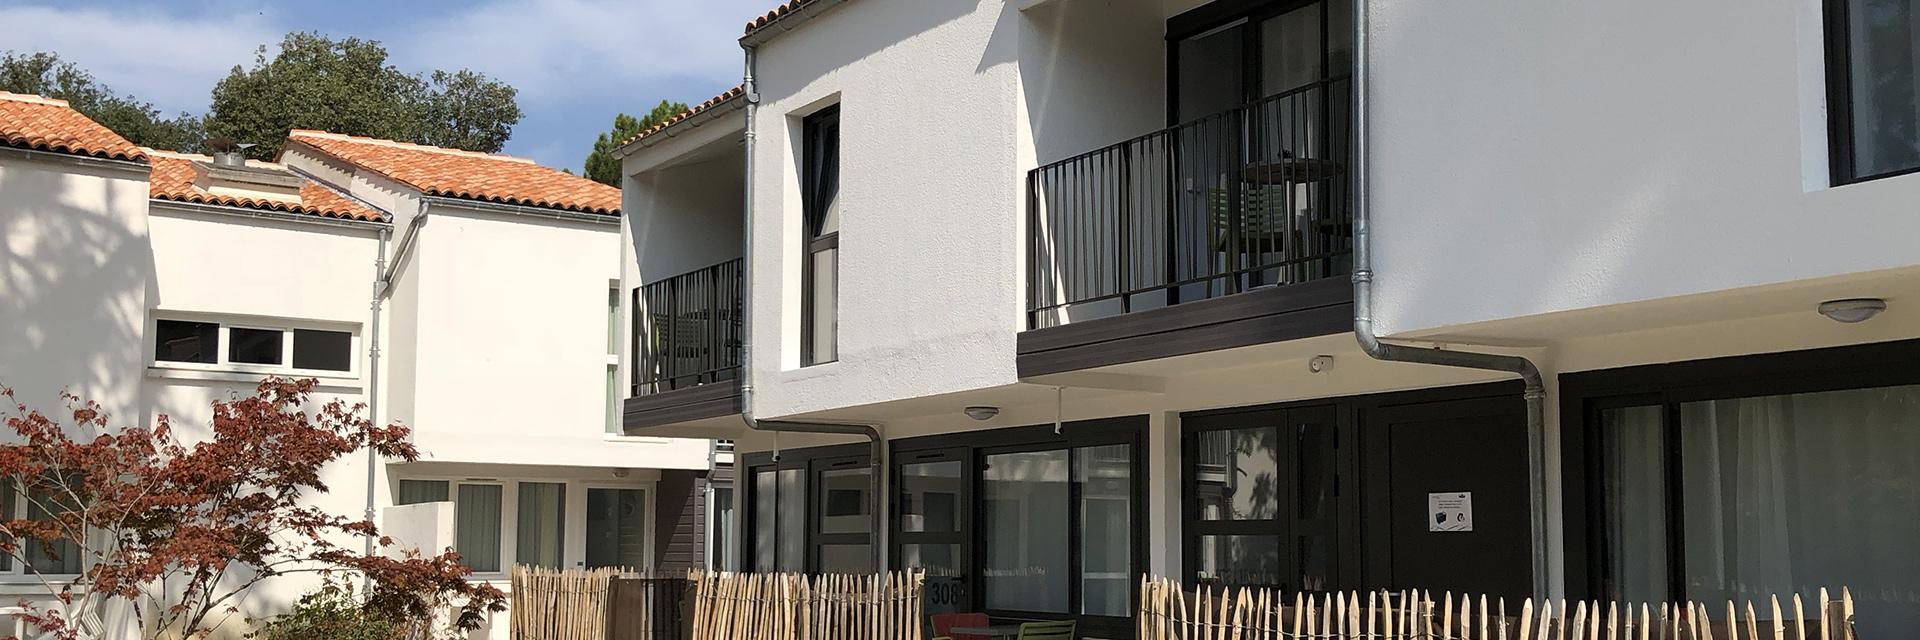 arc-en-ciel-oleron-CapFrance-residence2